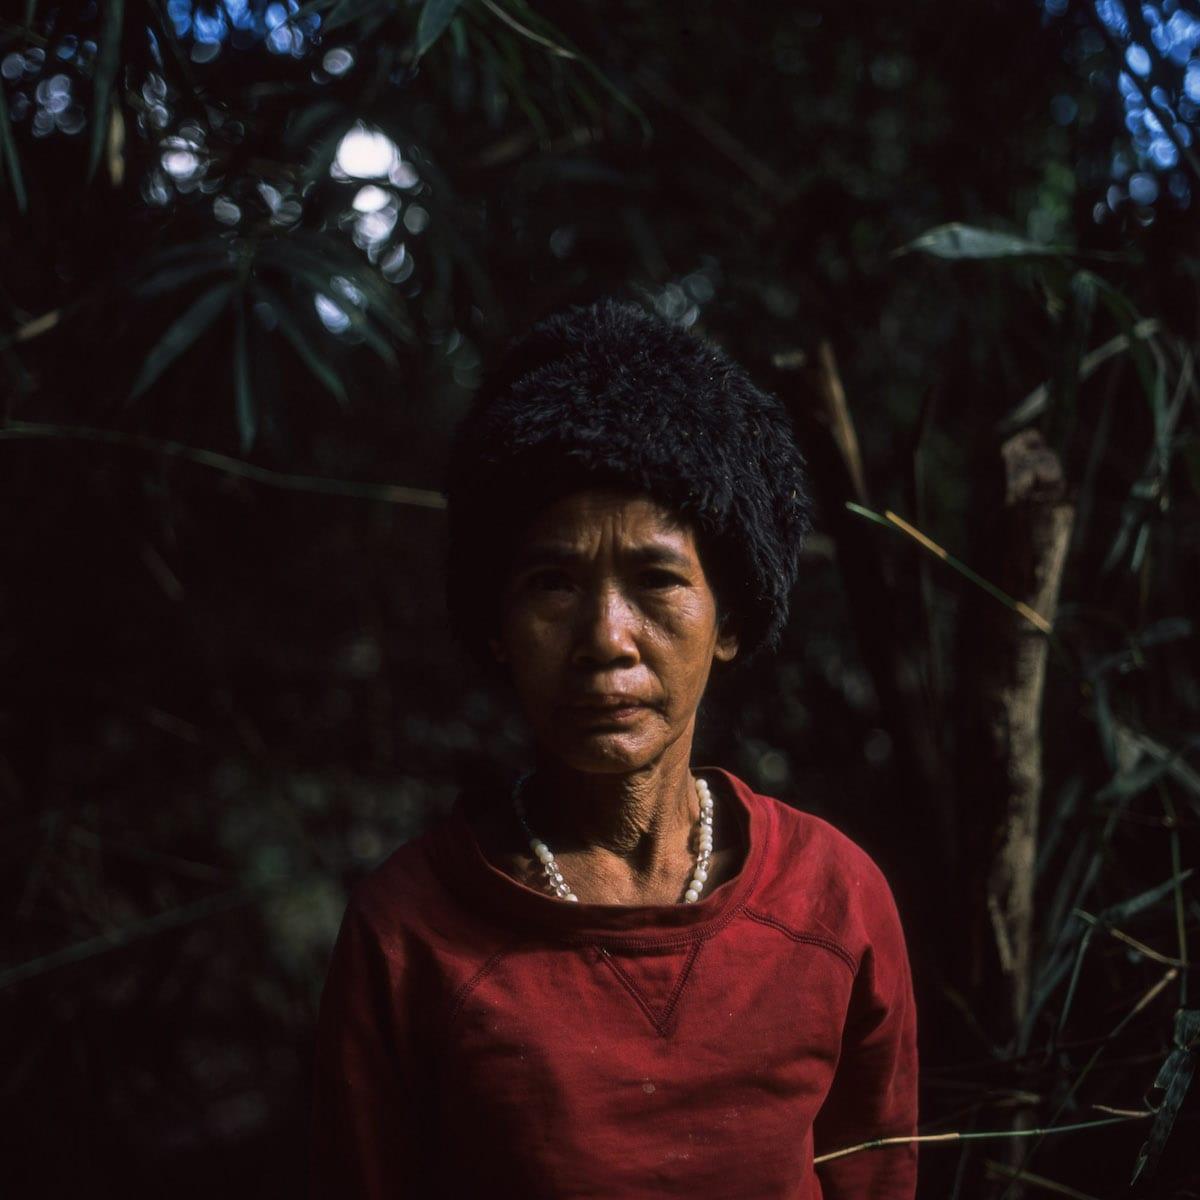 joe-lang-vietnam-portrait-of-britain-02